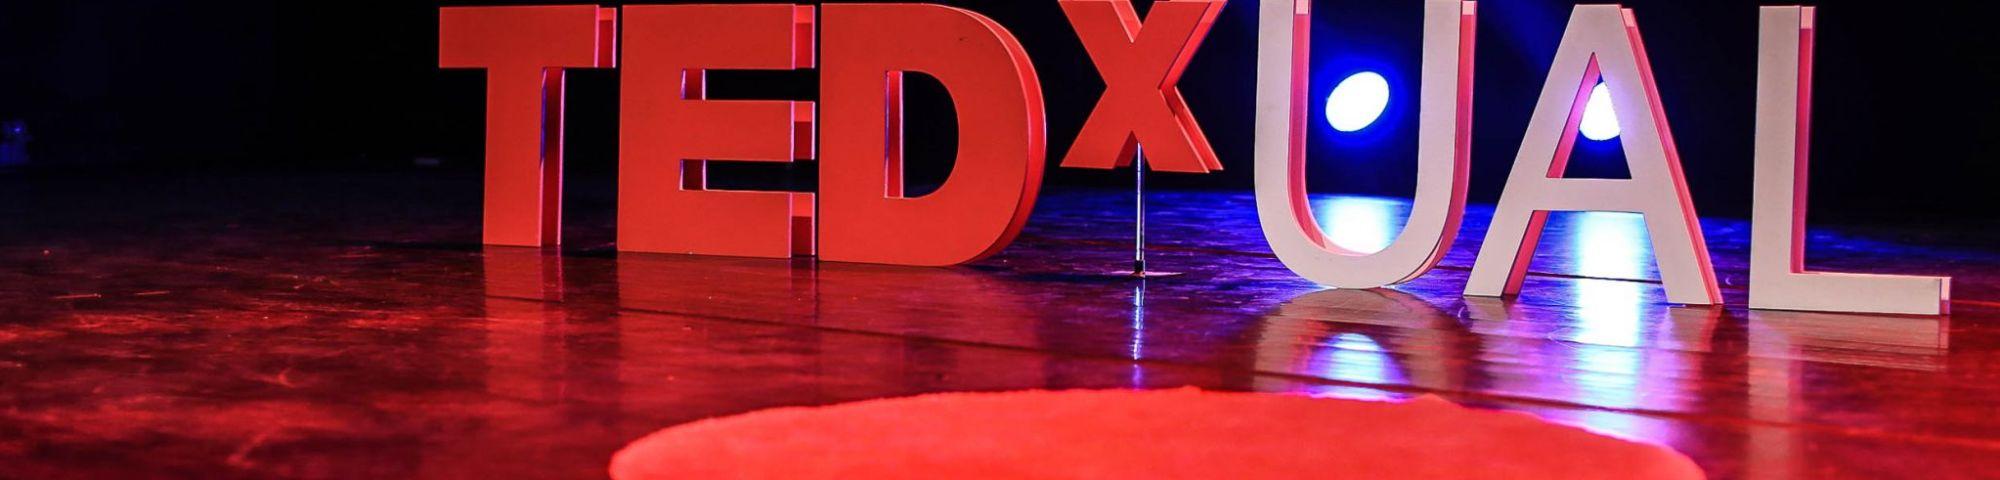 TEDxUAL stage branding photo by Stefan Griesche